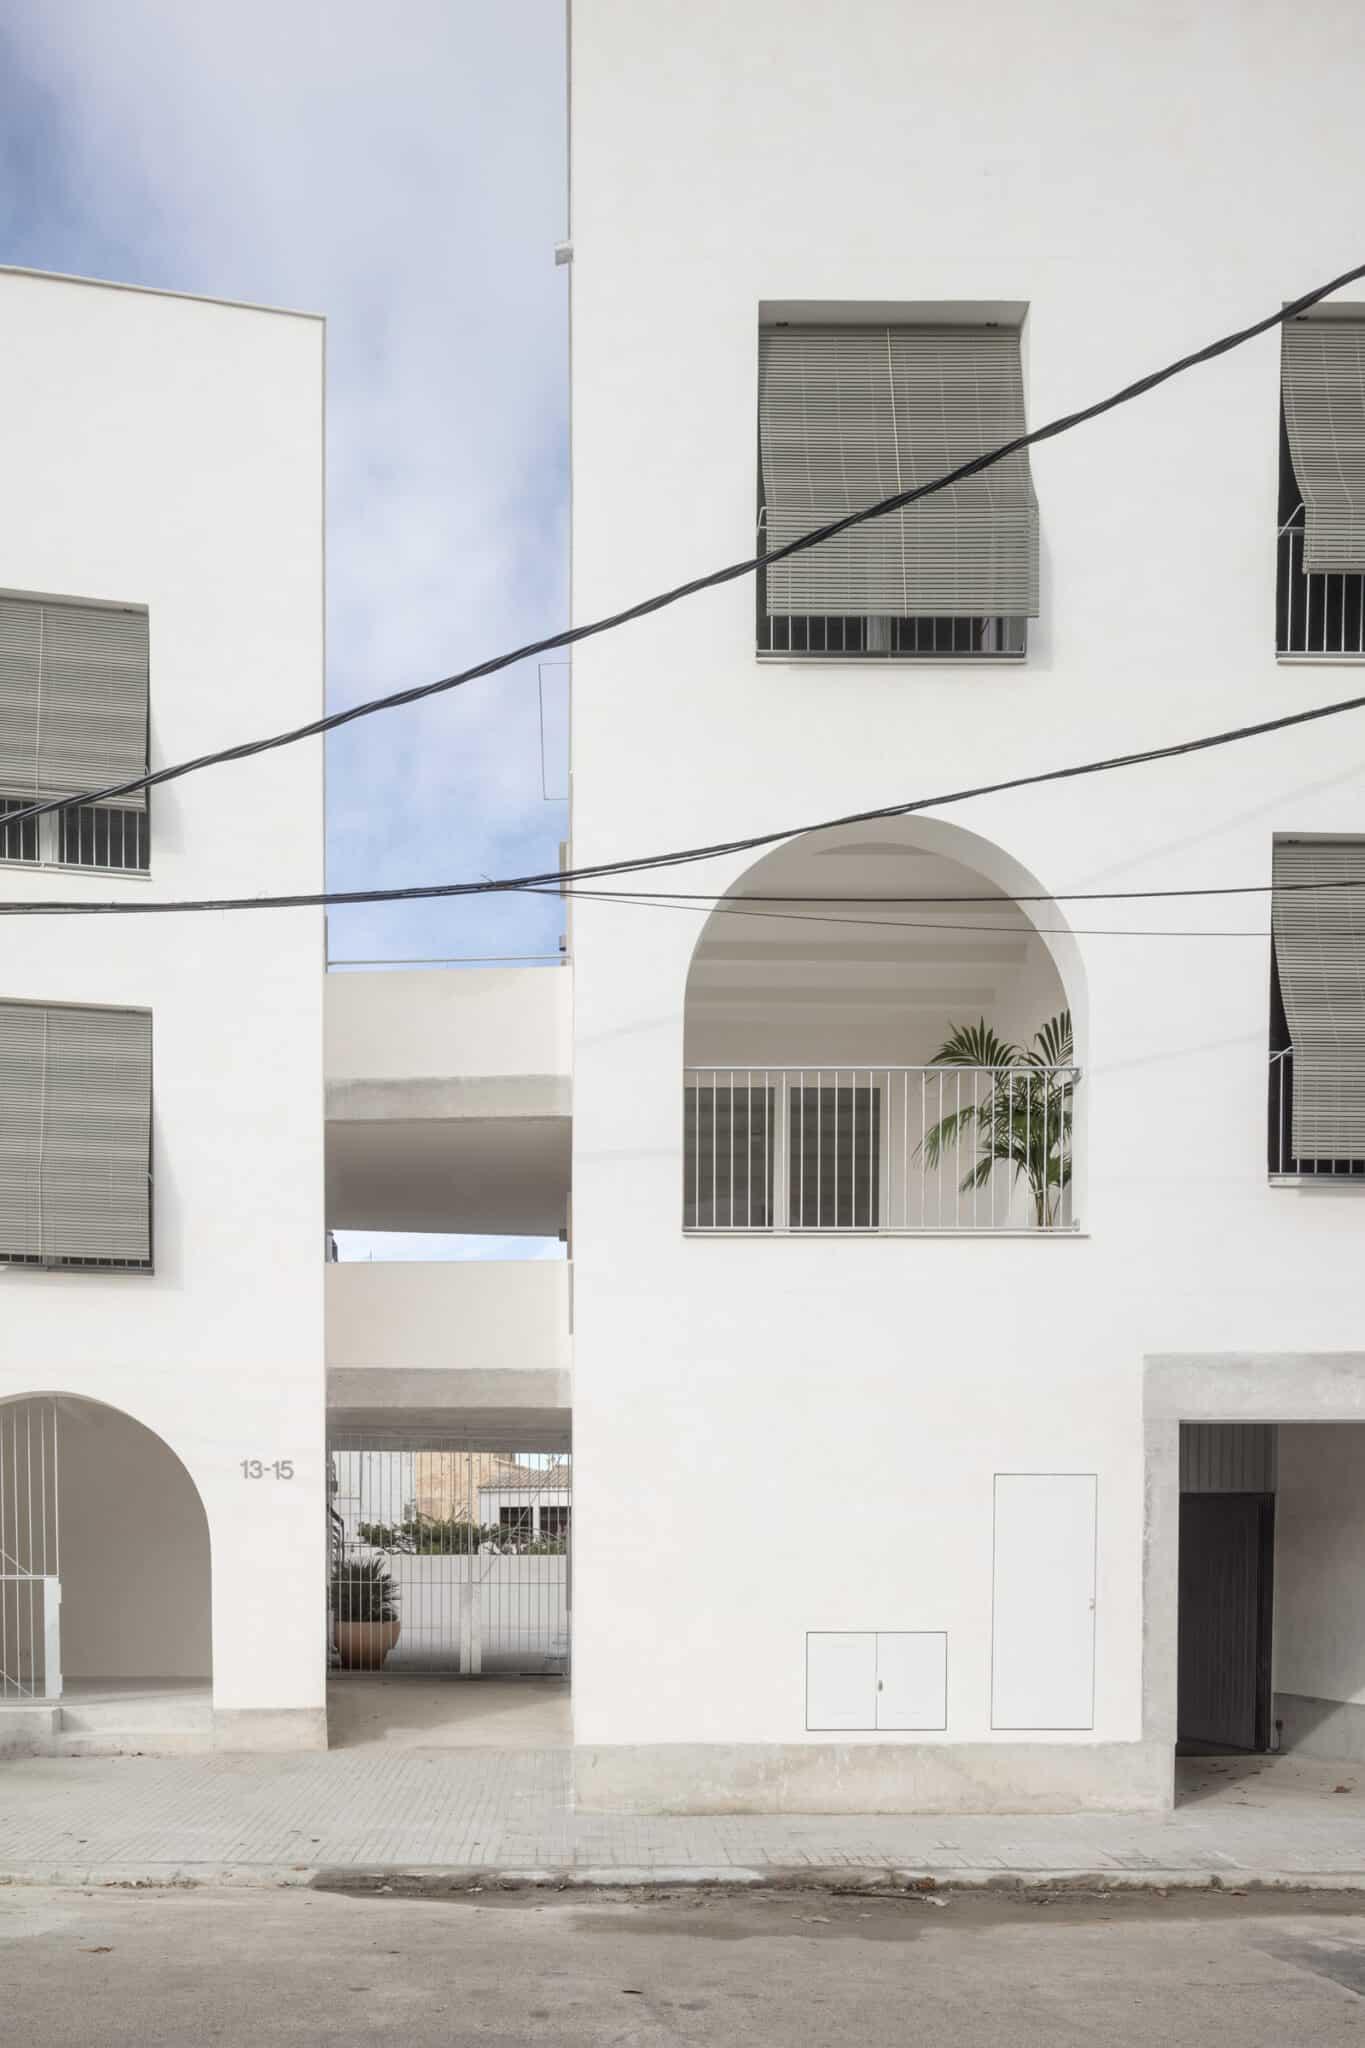 Habitatges Sant Pere de Ribes  - 20210617 DATAAE Habitatges 03.1 35